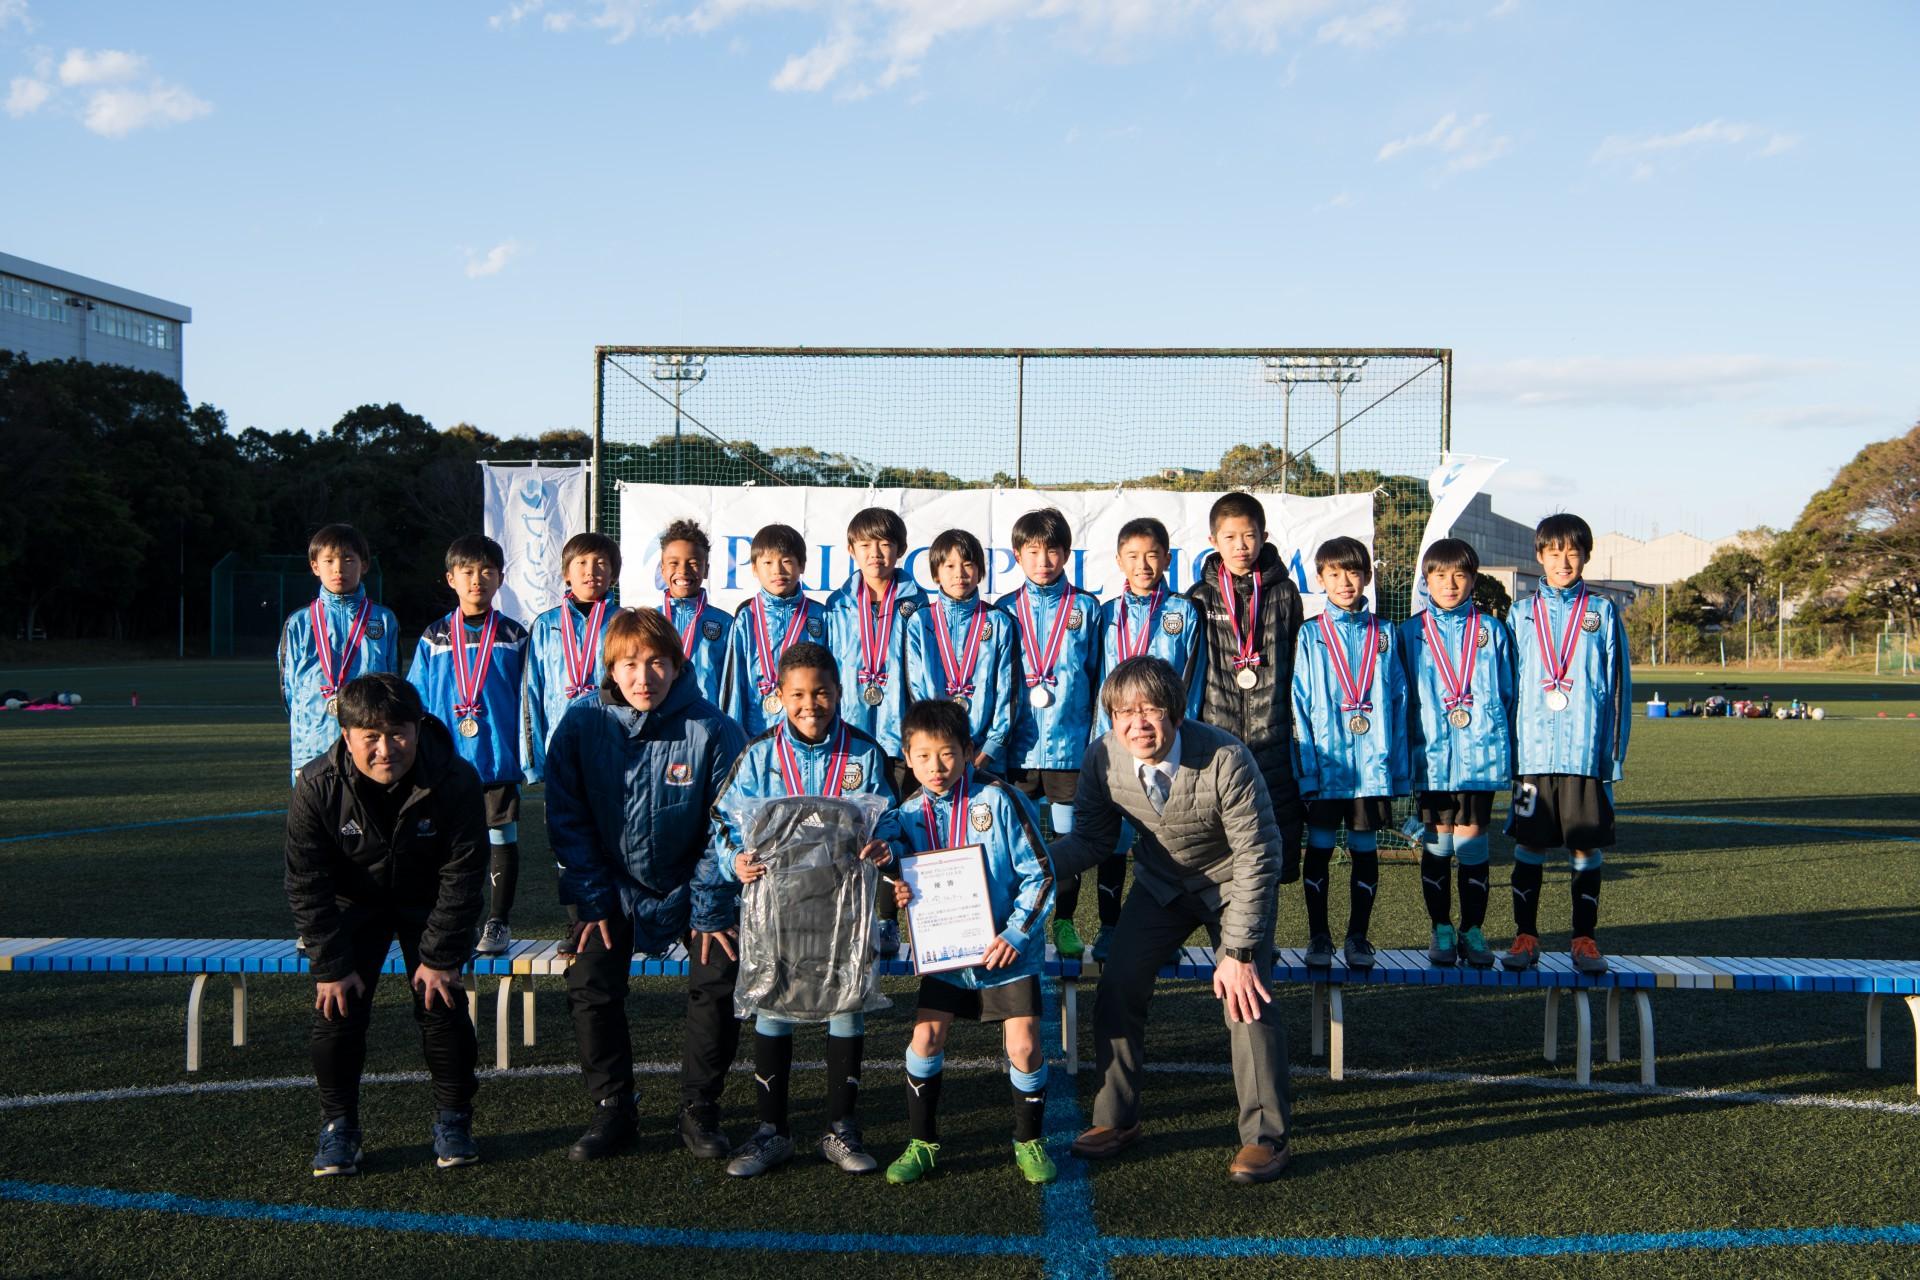 DSC_1133 第26回プリンシパルホームF・Marinos CUP U-10